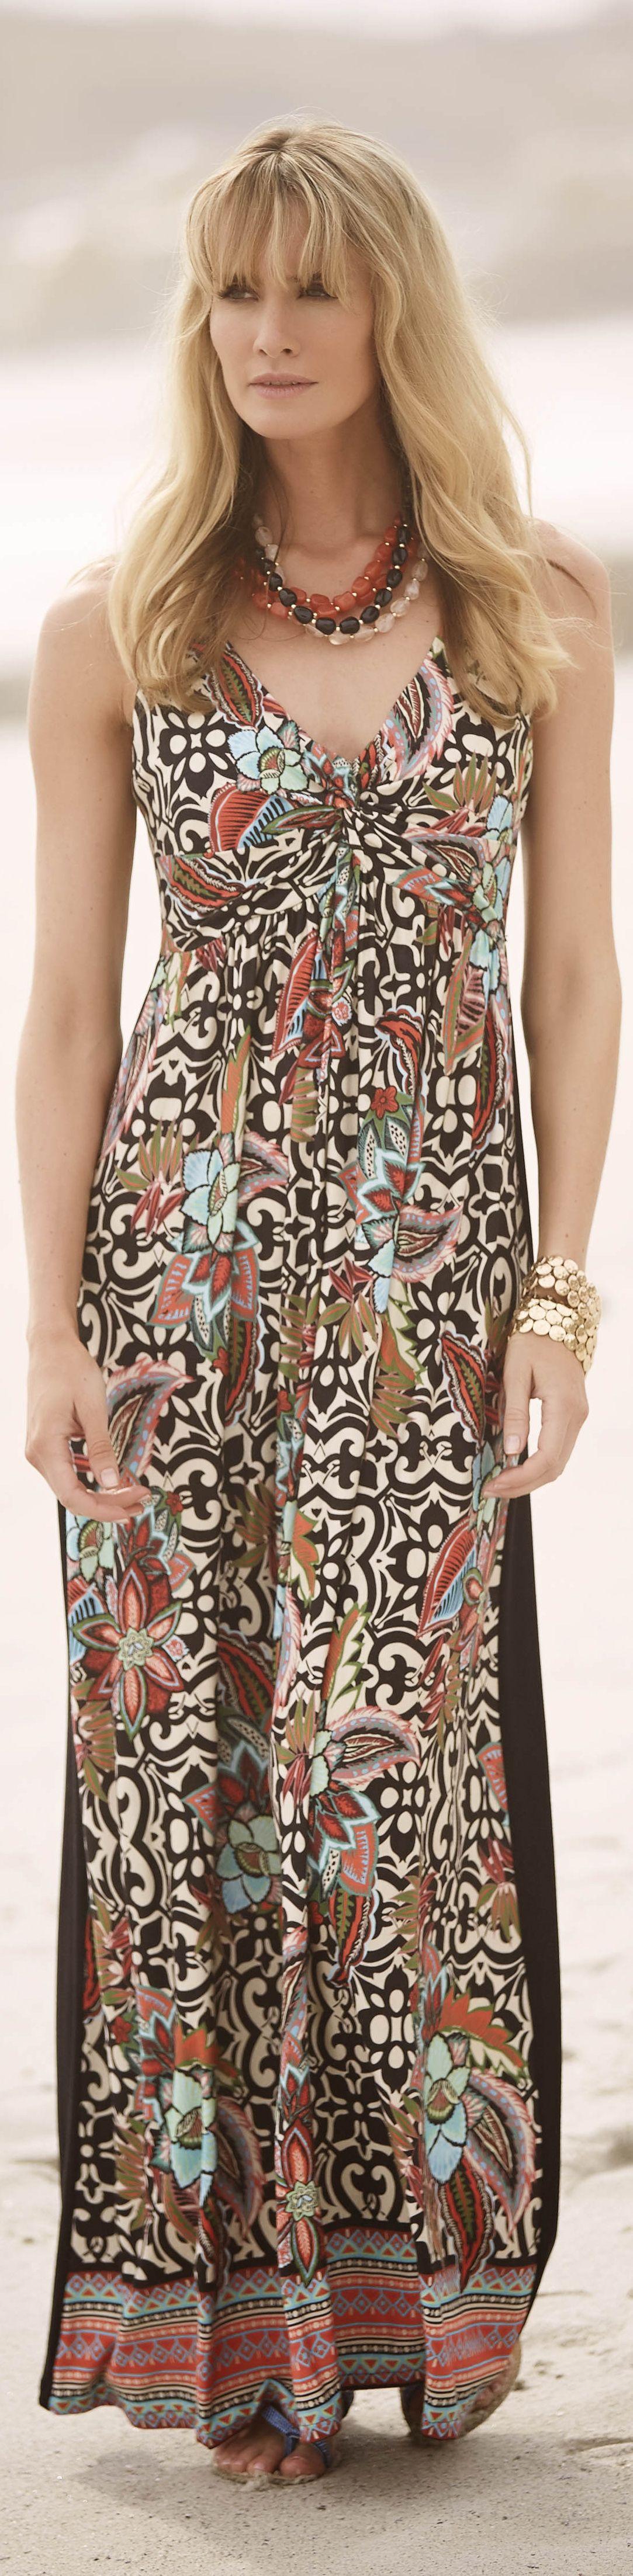 Online india maxi dresses for 60 year olds yepme shanghai